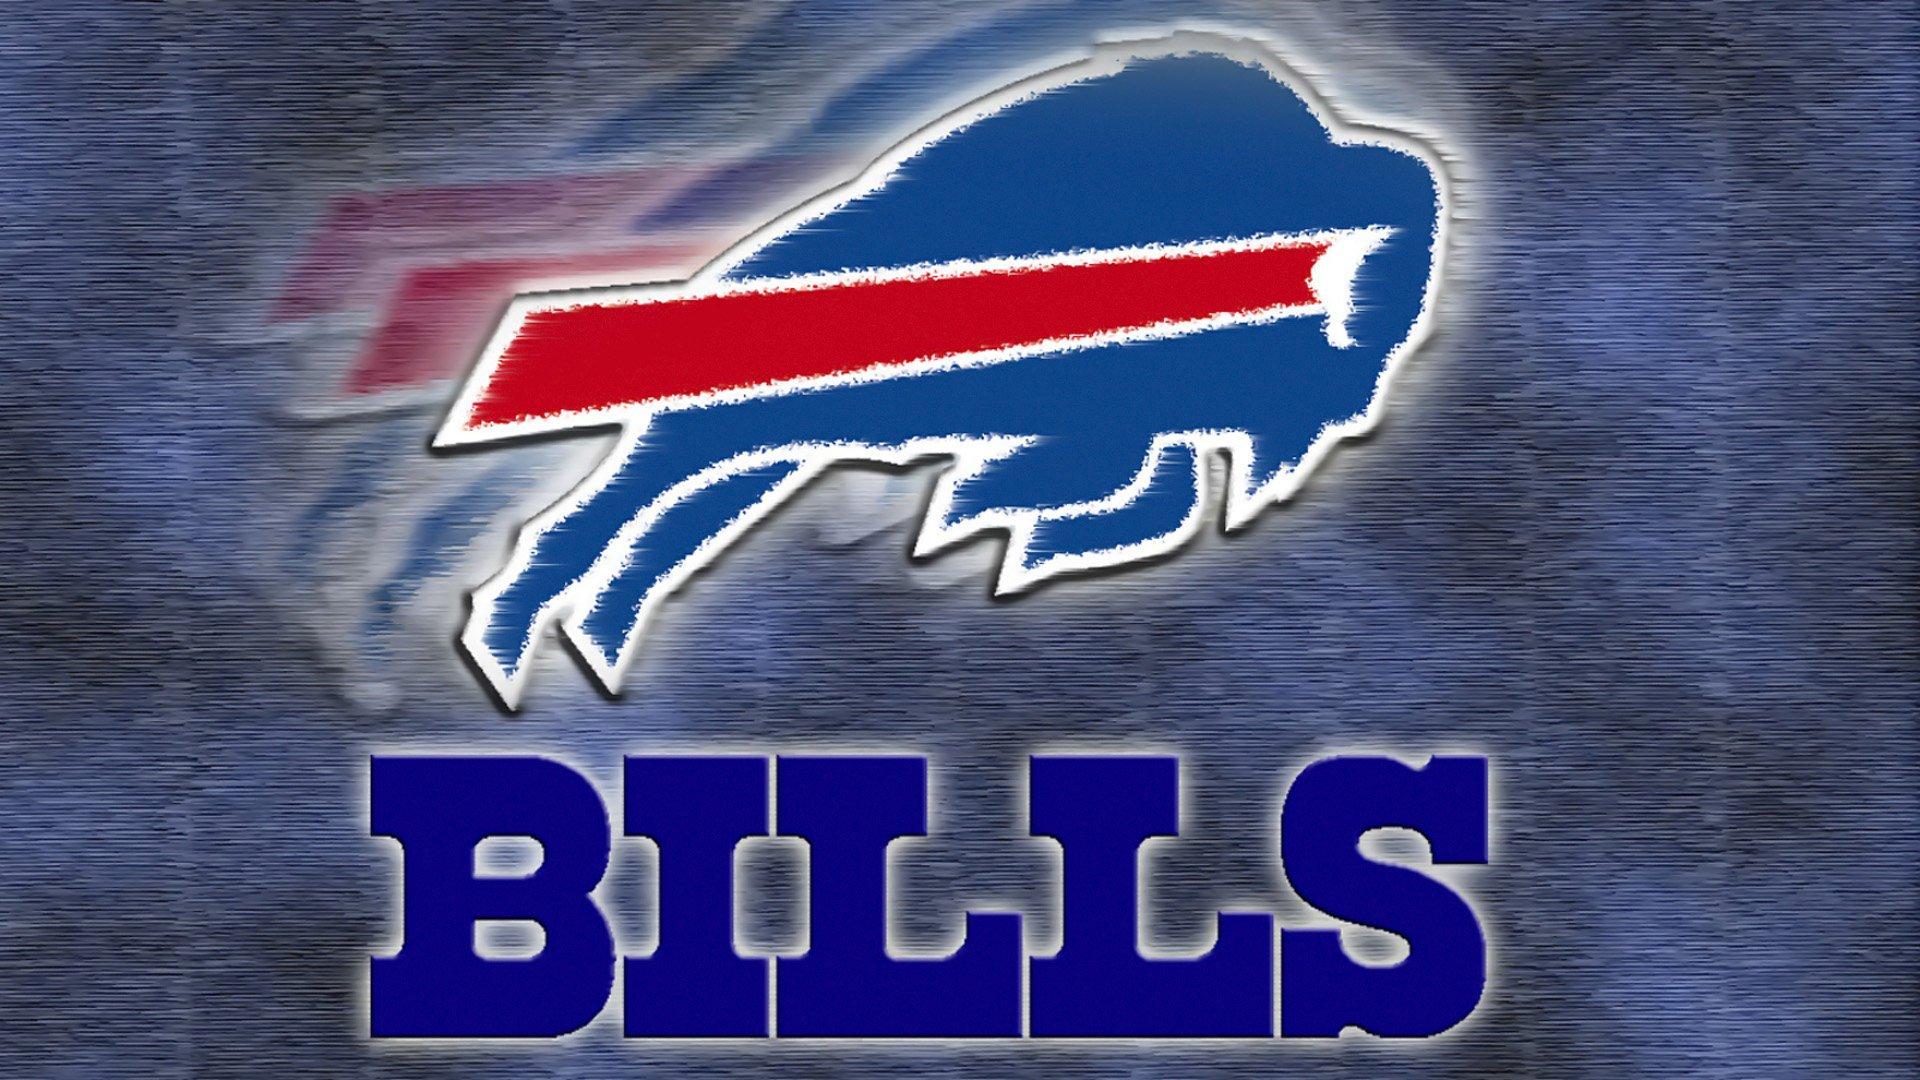 buffalo bills screensavers logo screensaver 1920x1080 1920x1080